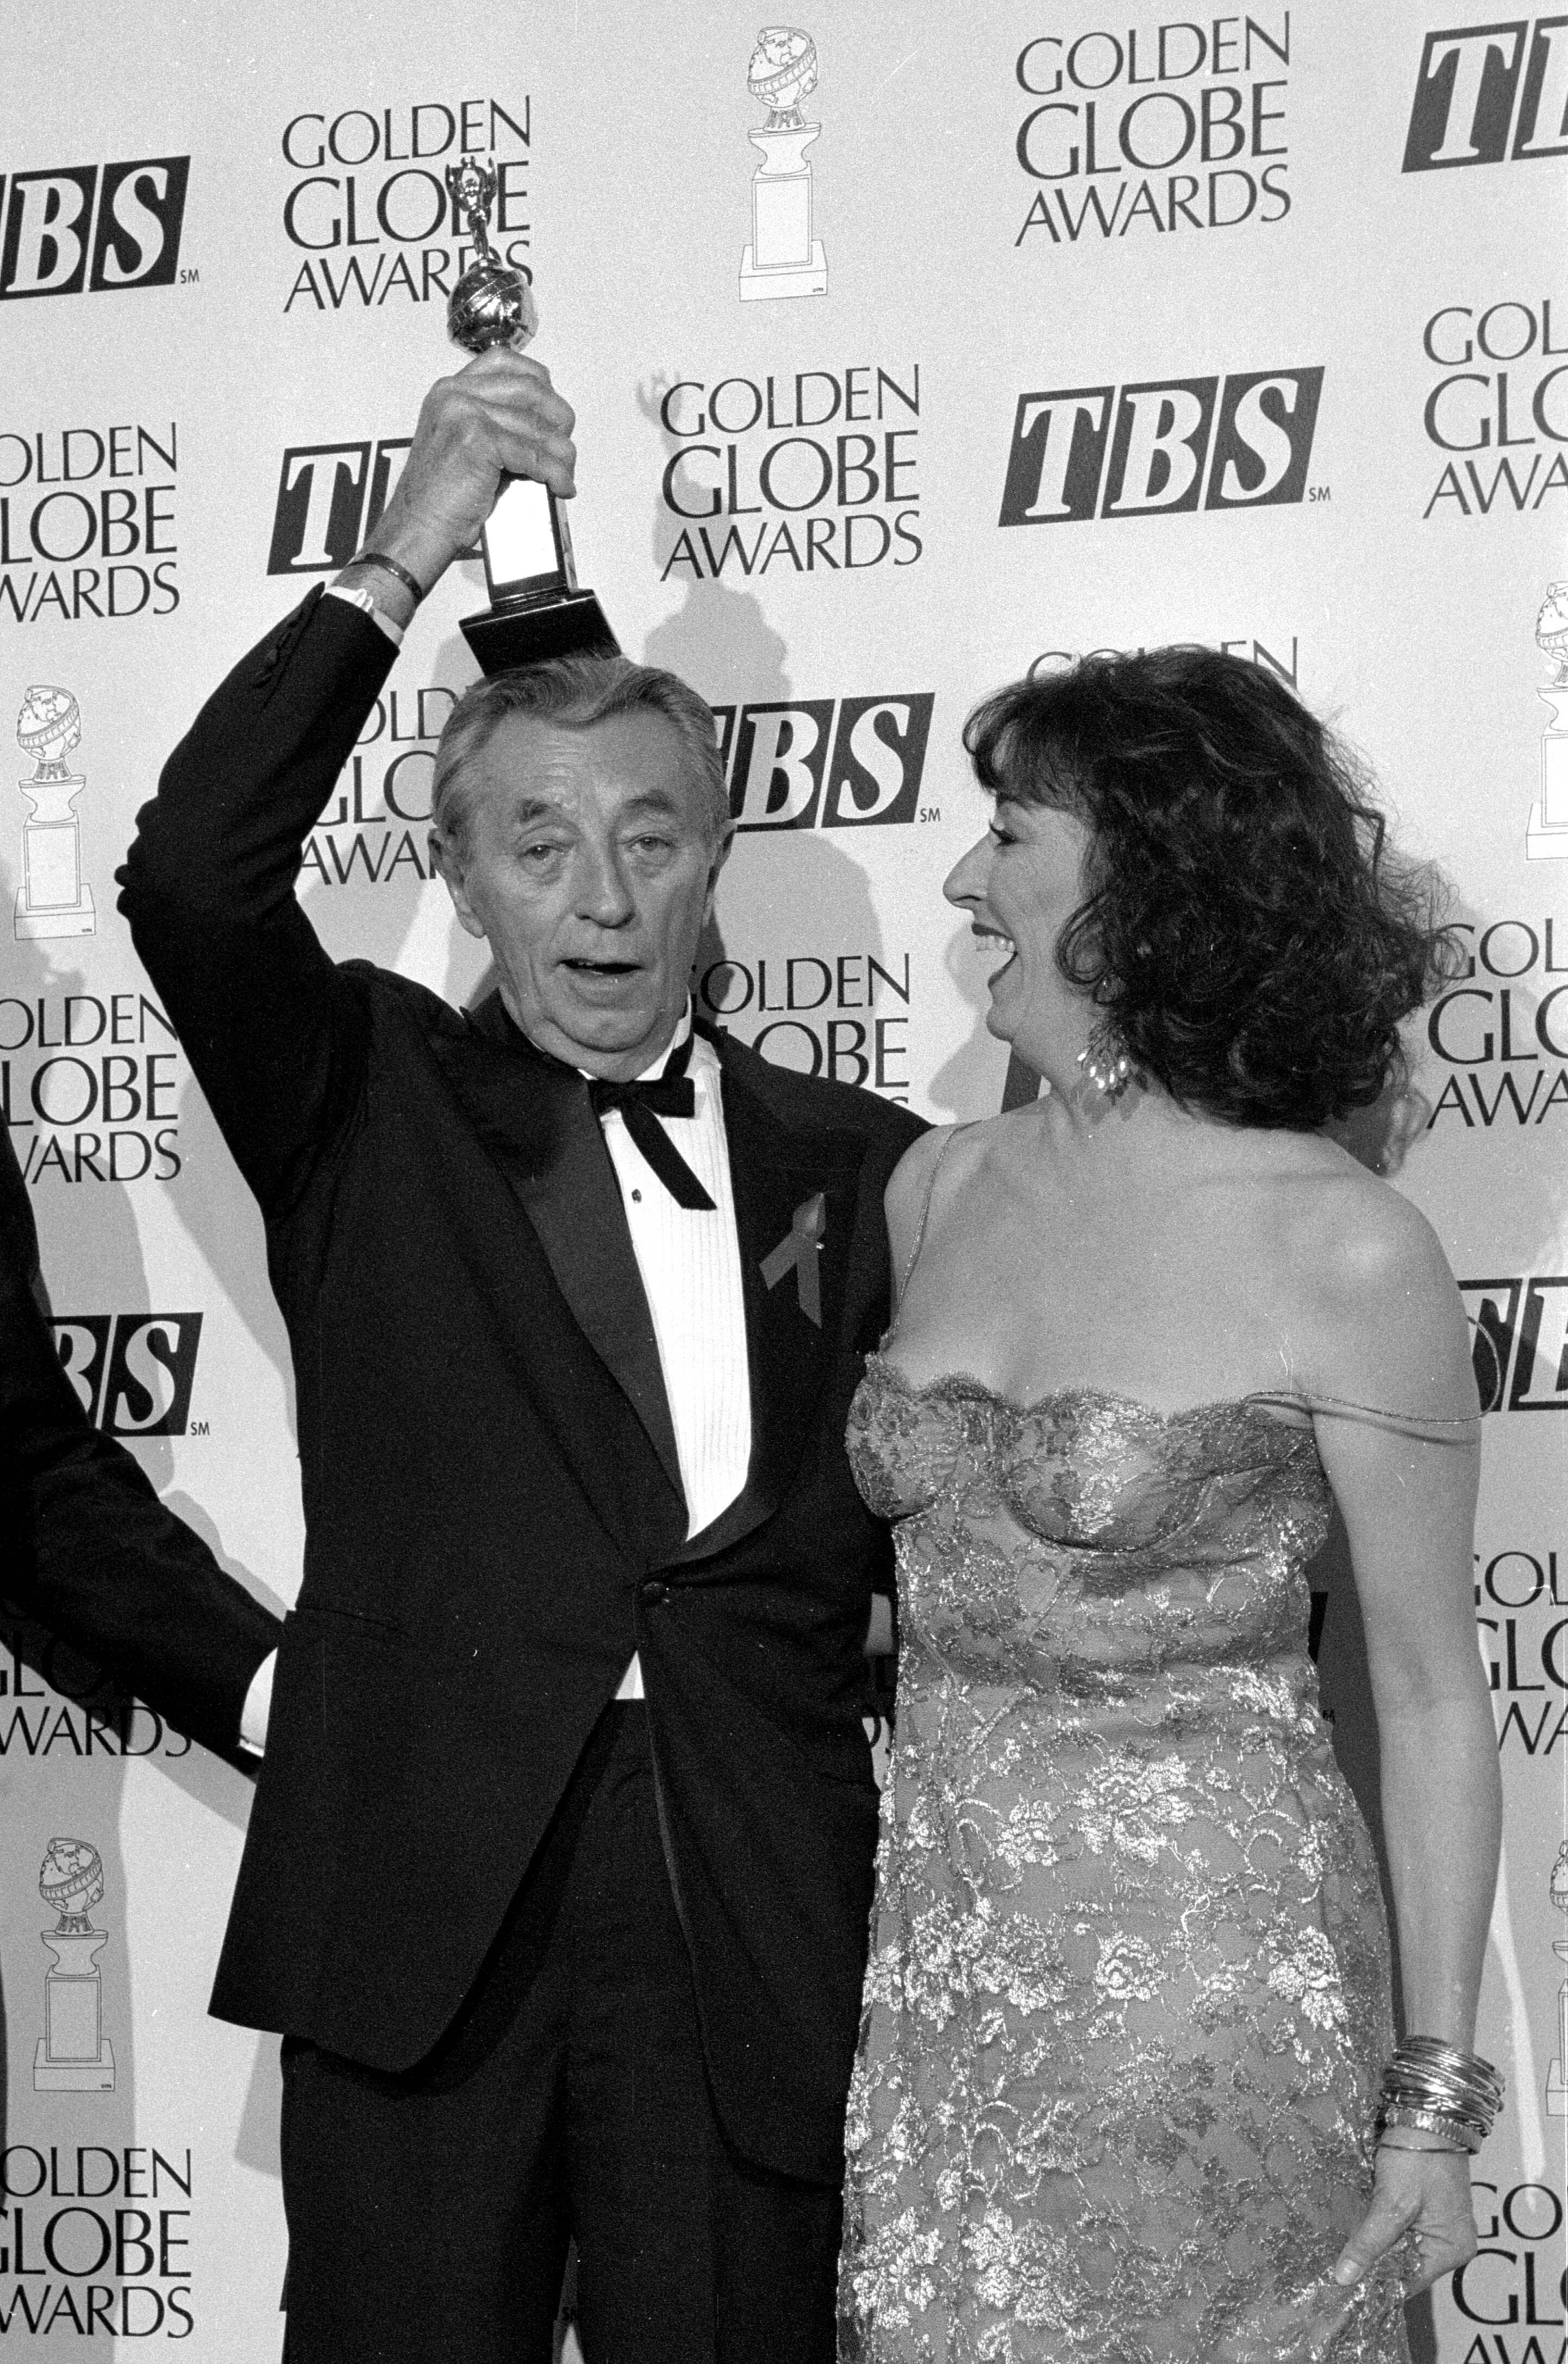 Robert Mitchum and Anelica Huston backsatge at the Golden Globes, 1992